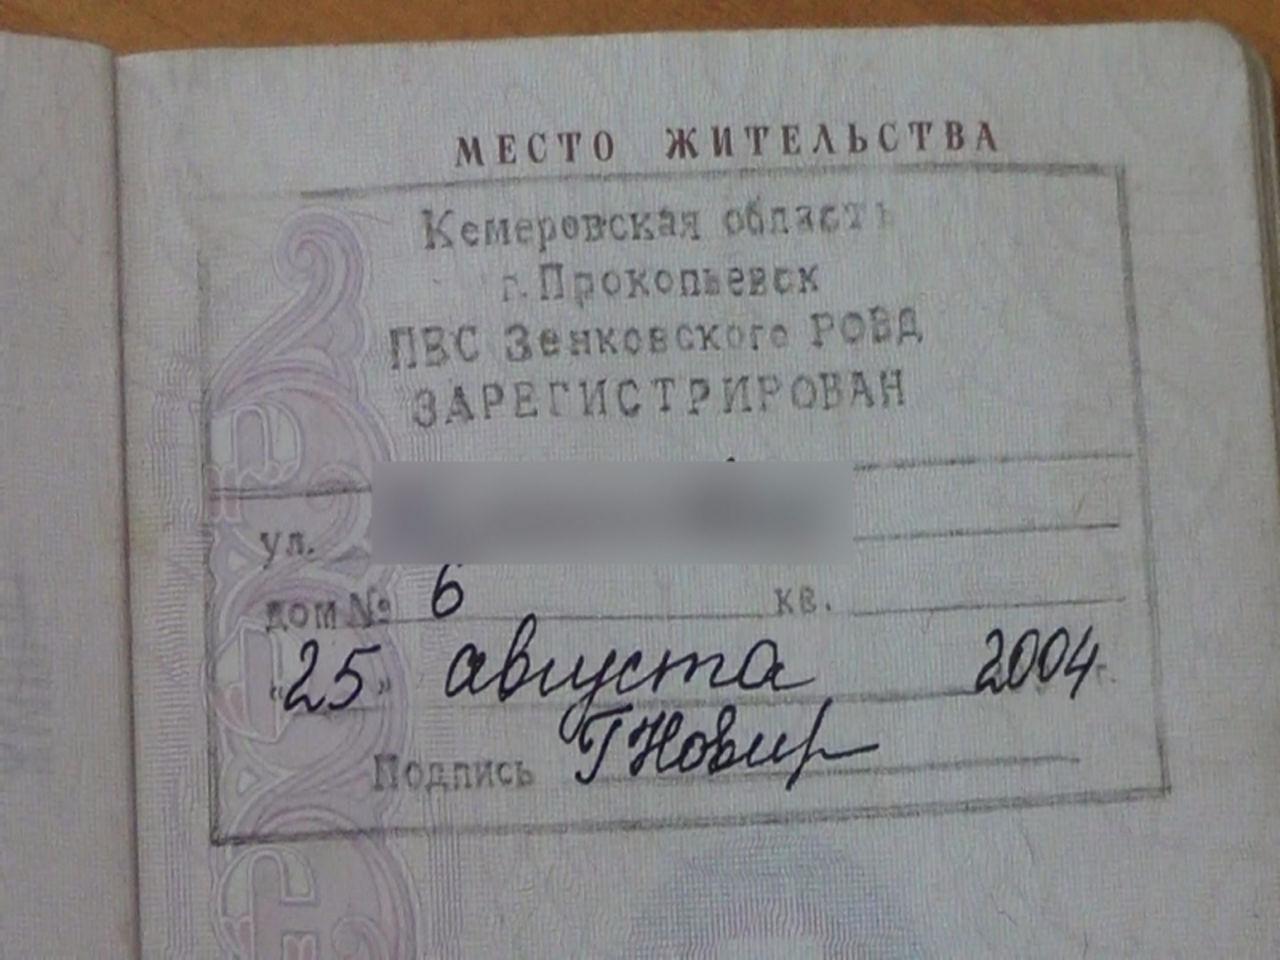 Работа в новокузнецке без прописки 11 фотография